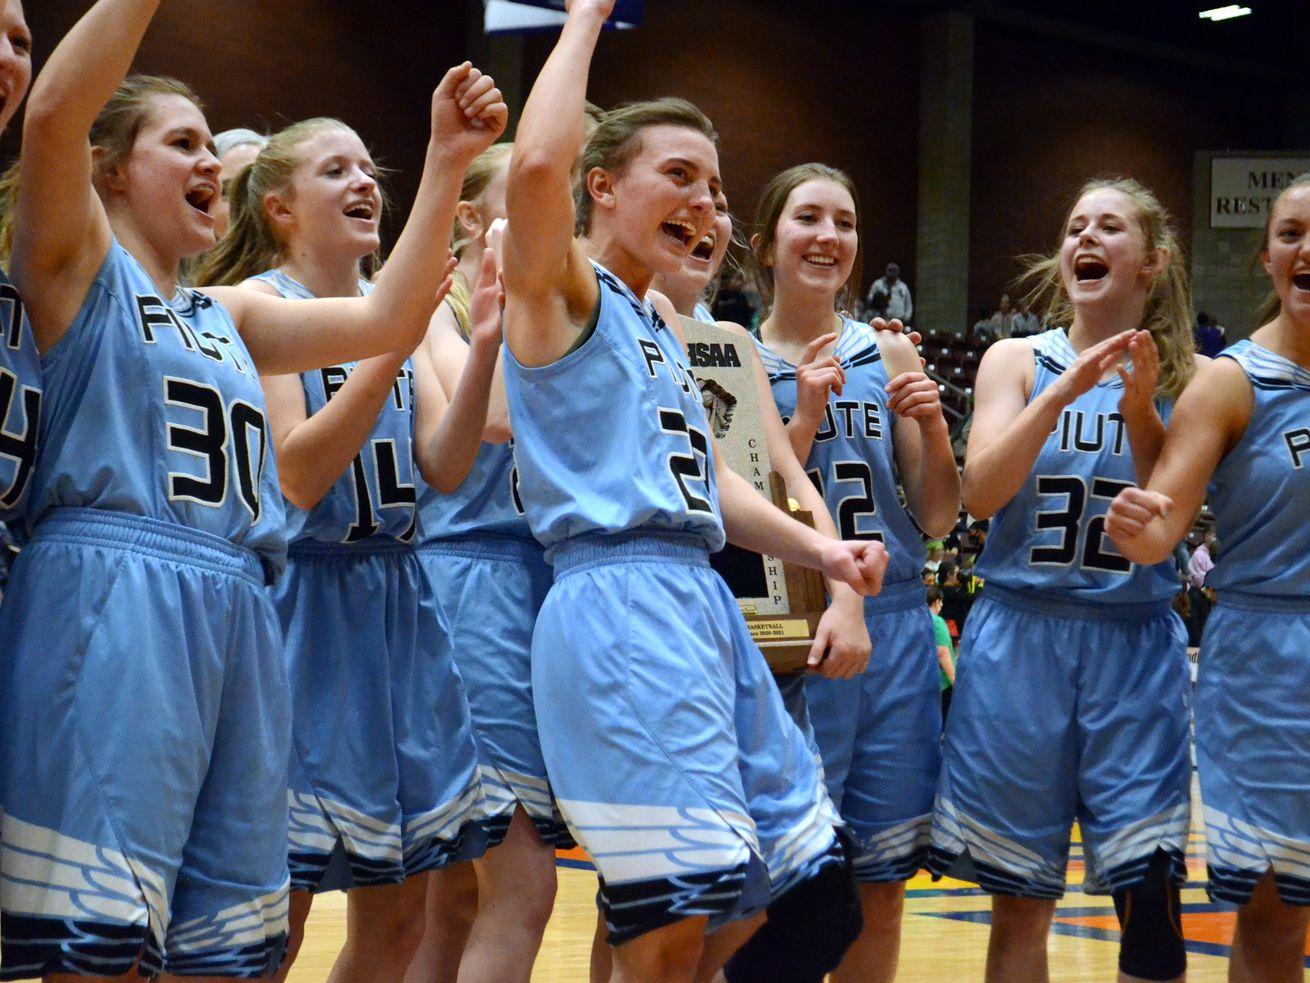 High school girls basketball: Piute nips Valley in girls' 1A championship, 44-40